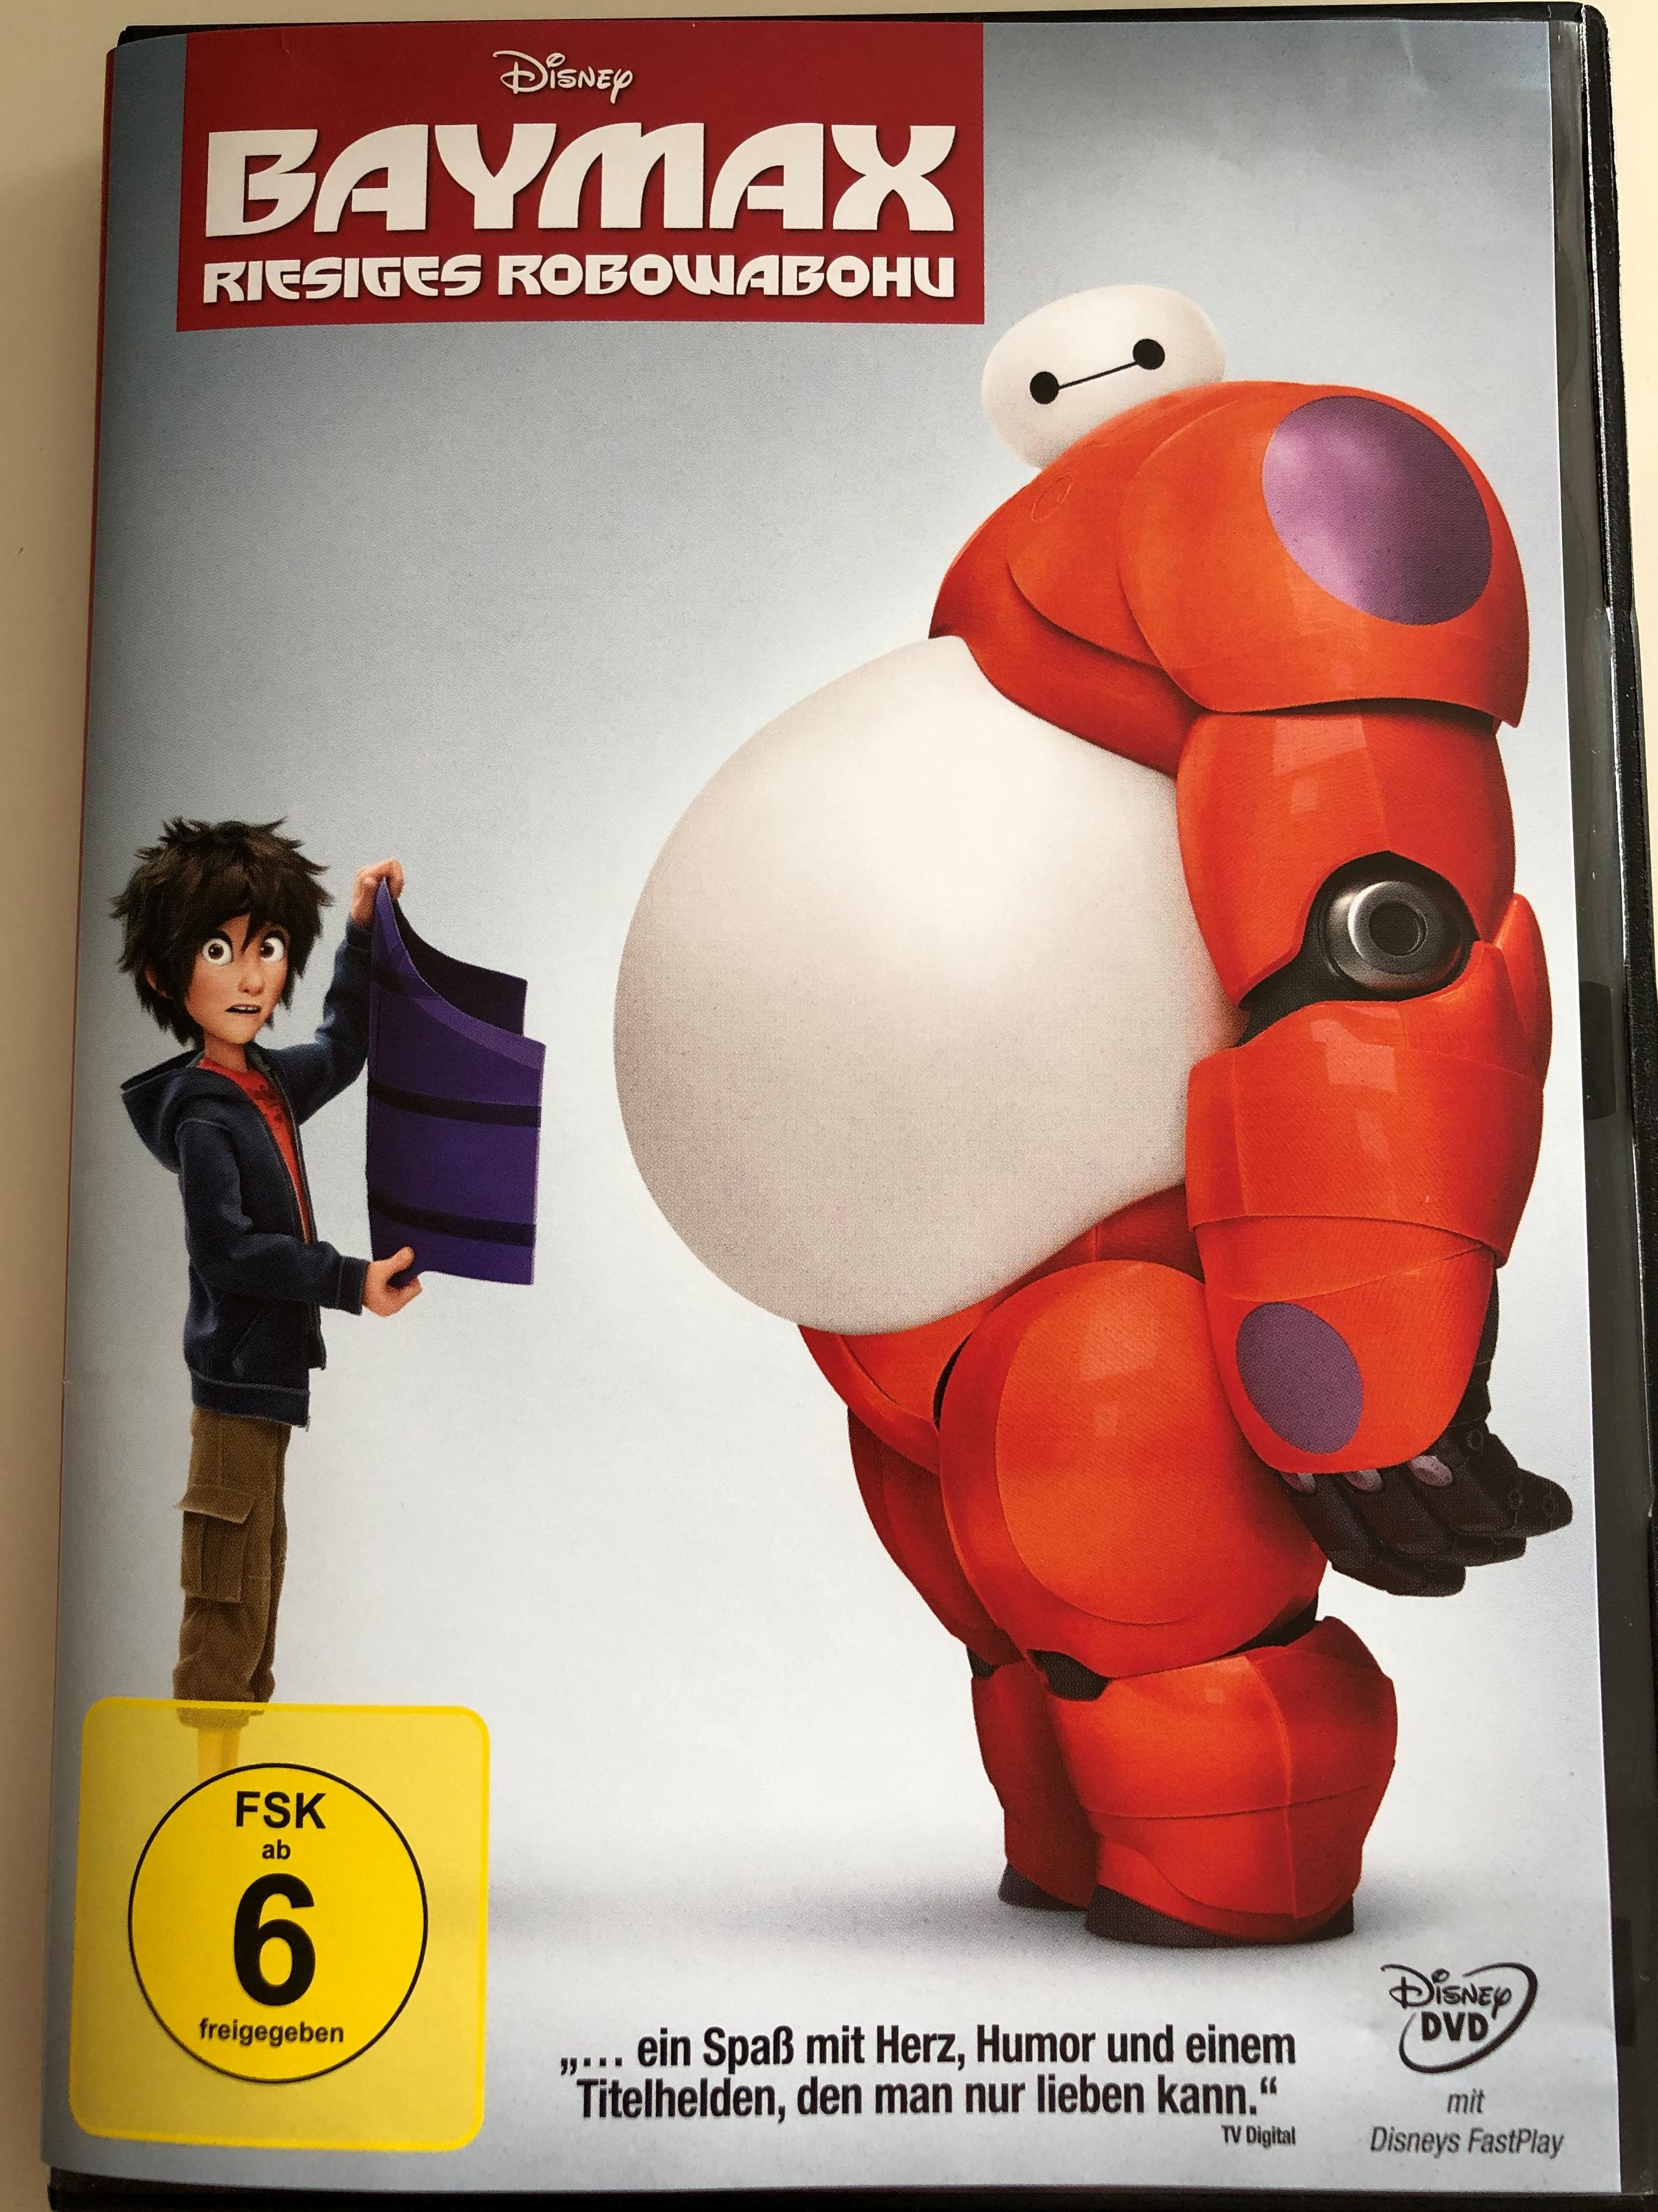 big-hero-6-dvd-2014-baymax-reisiges-robowabohu-directed-by-don-hall-chris-williams-starring-ryan-potter-scott-adsit-daniel-henney-t.j.-miller-jamie-chung-damon-wayans-jr.-genesis-rodriguez-james-c-1-.jpg